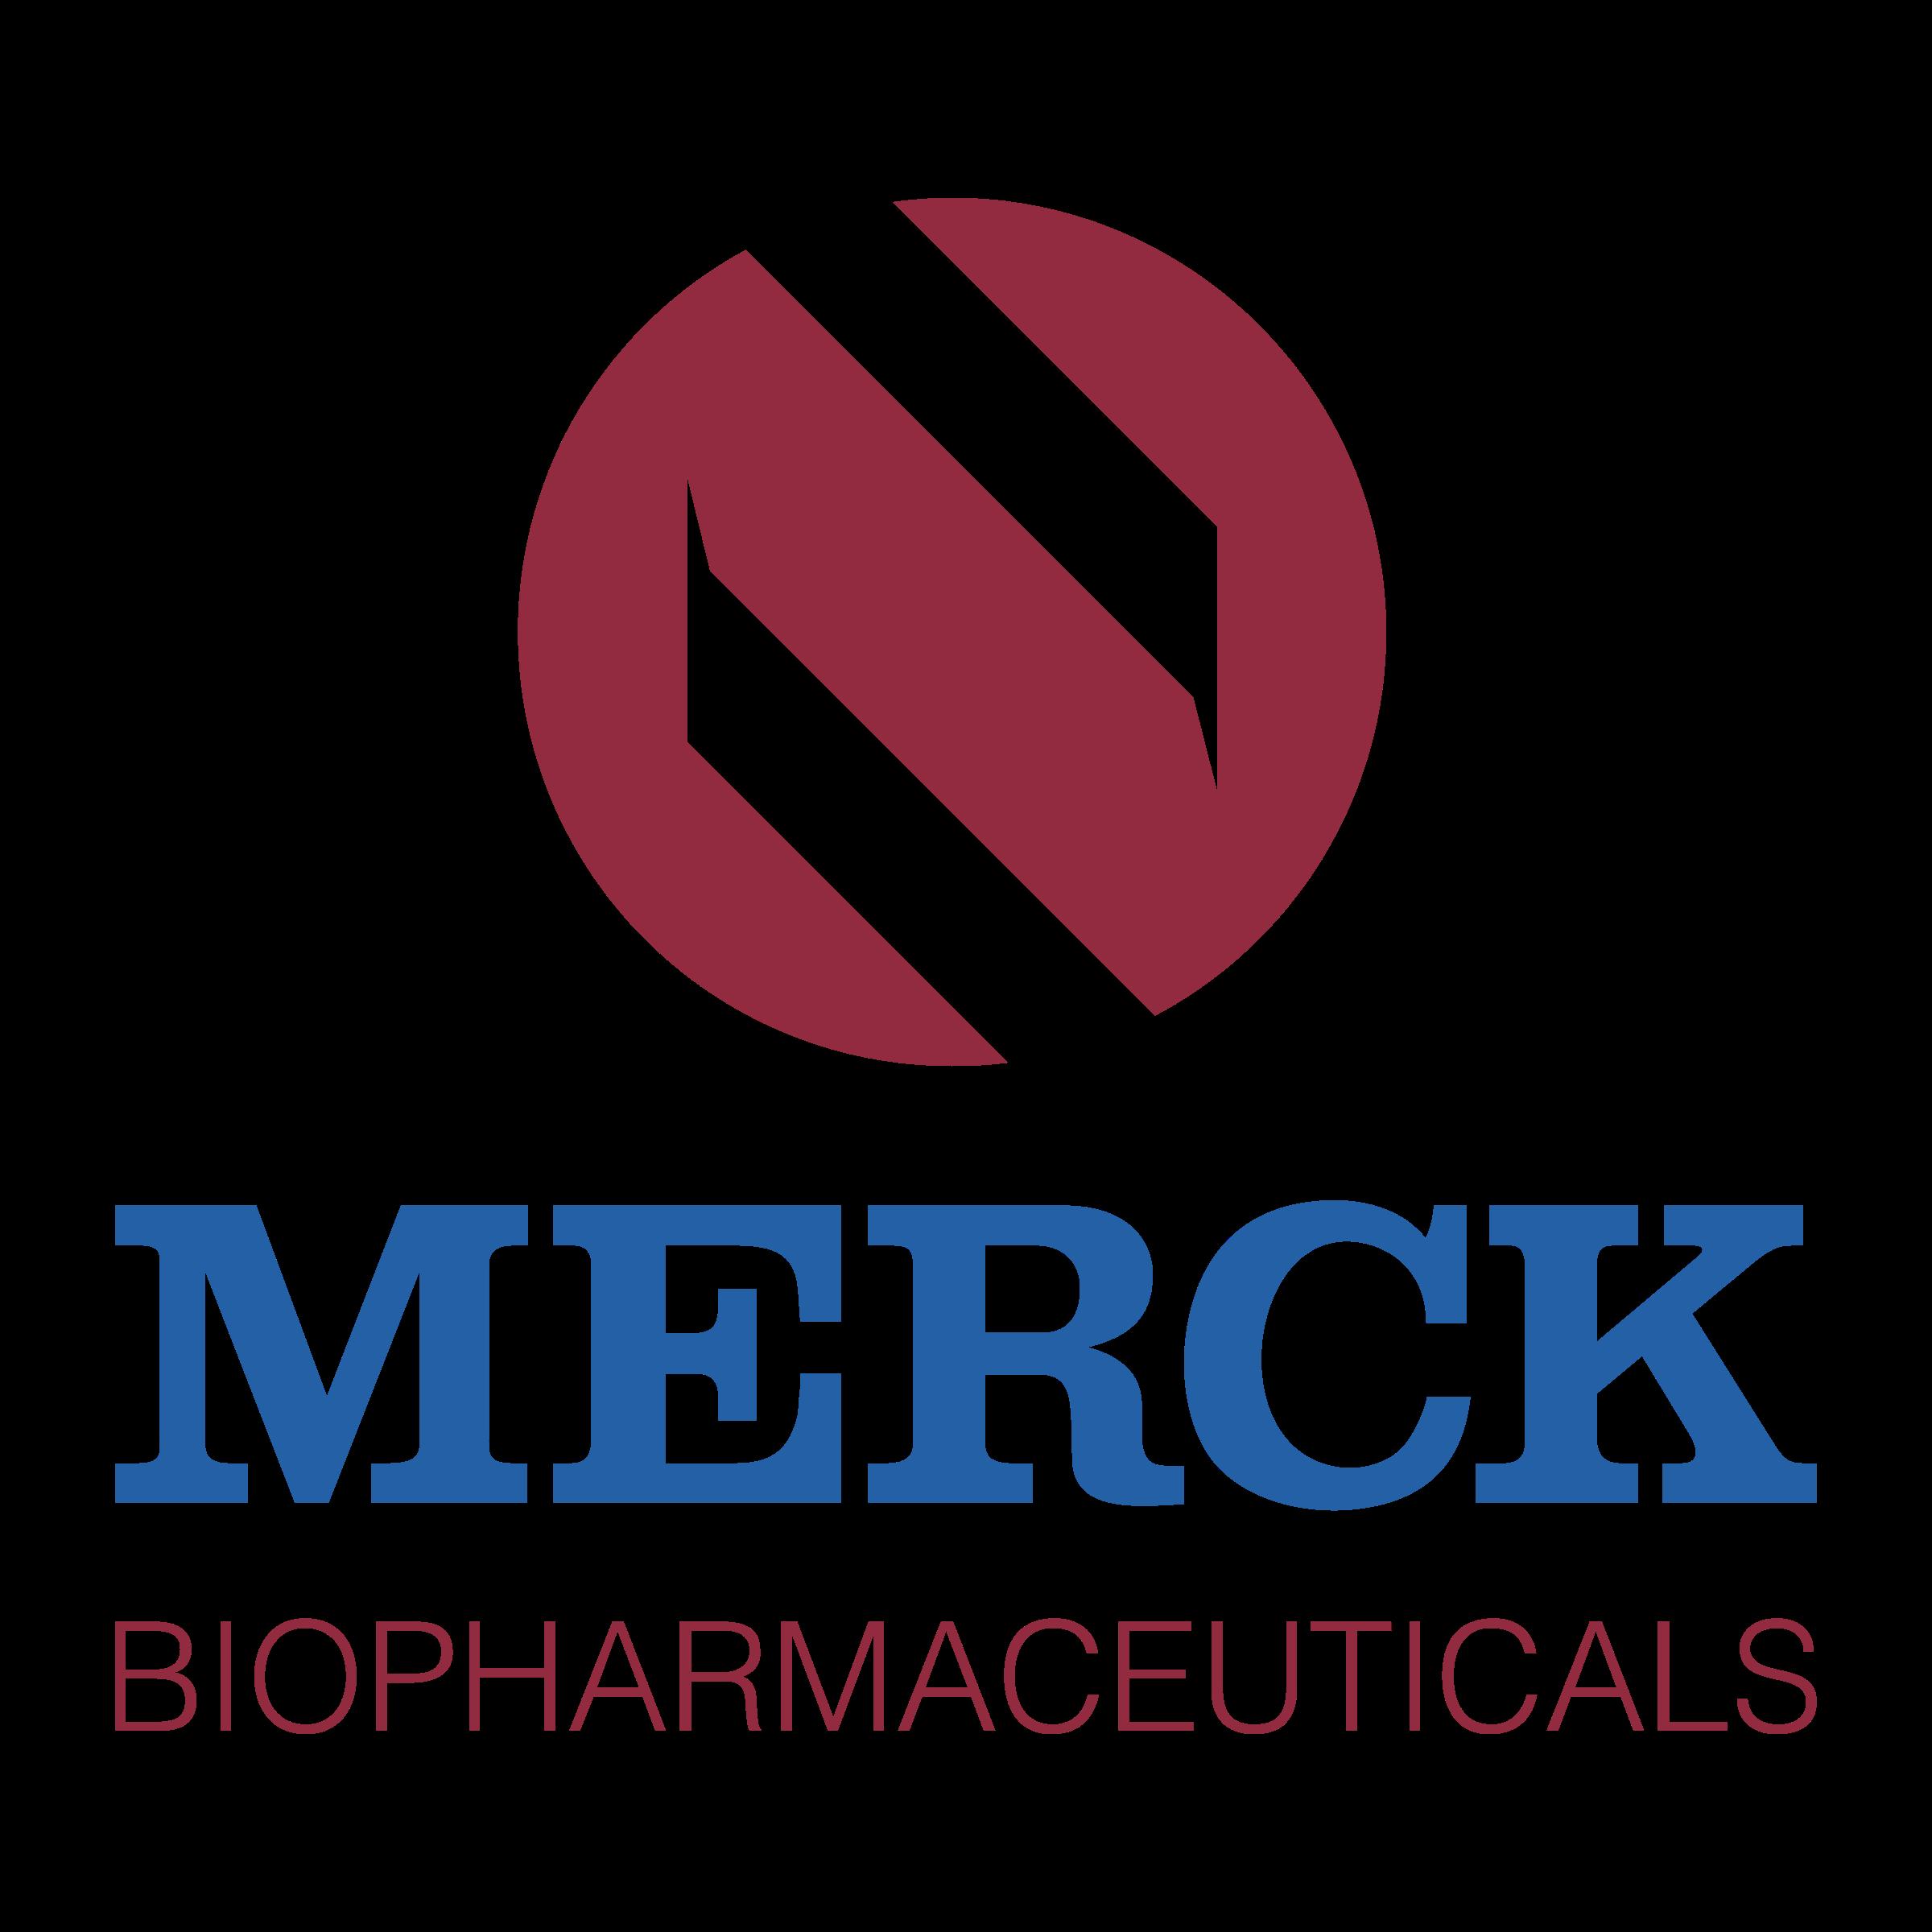 Merck Biopharmaceuticals Logo PNG Transparent & SVG Vector.